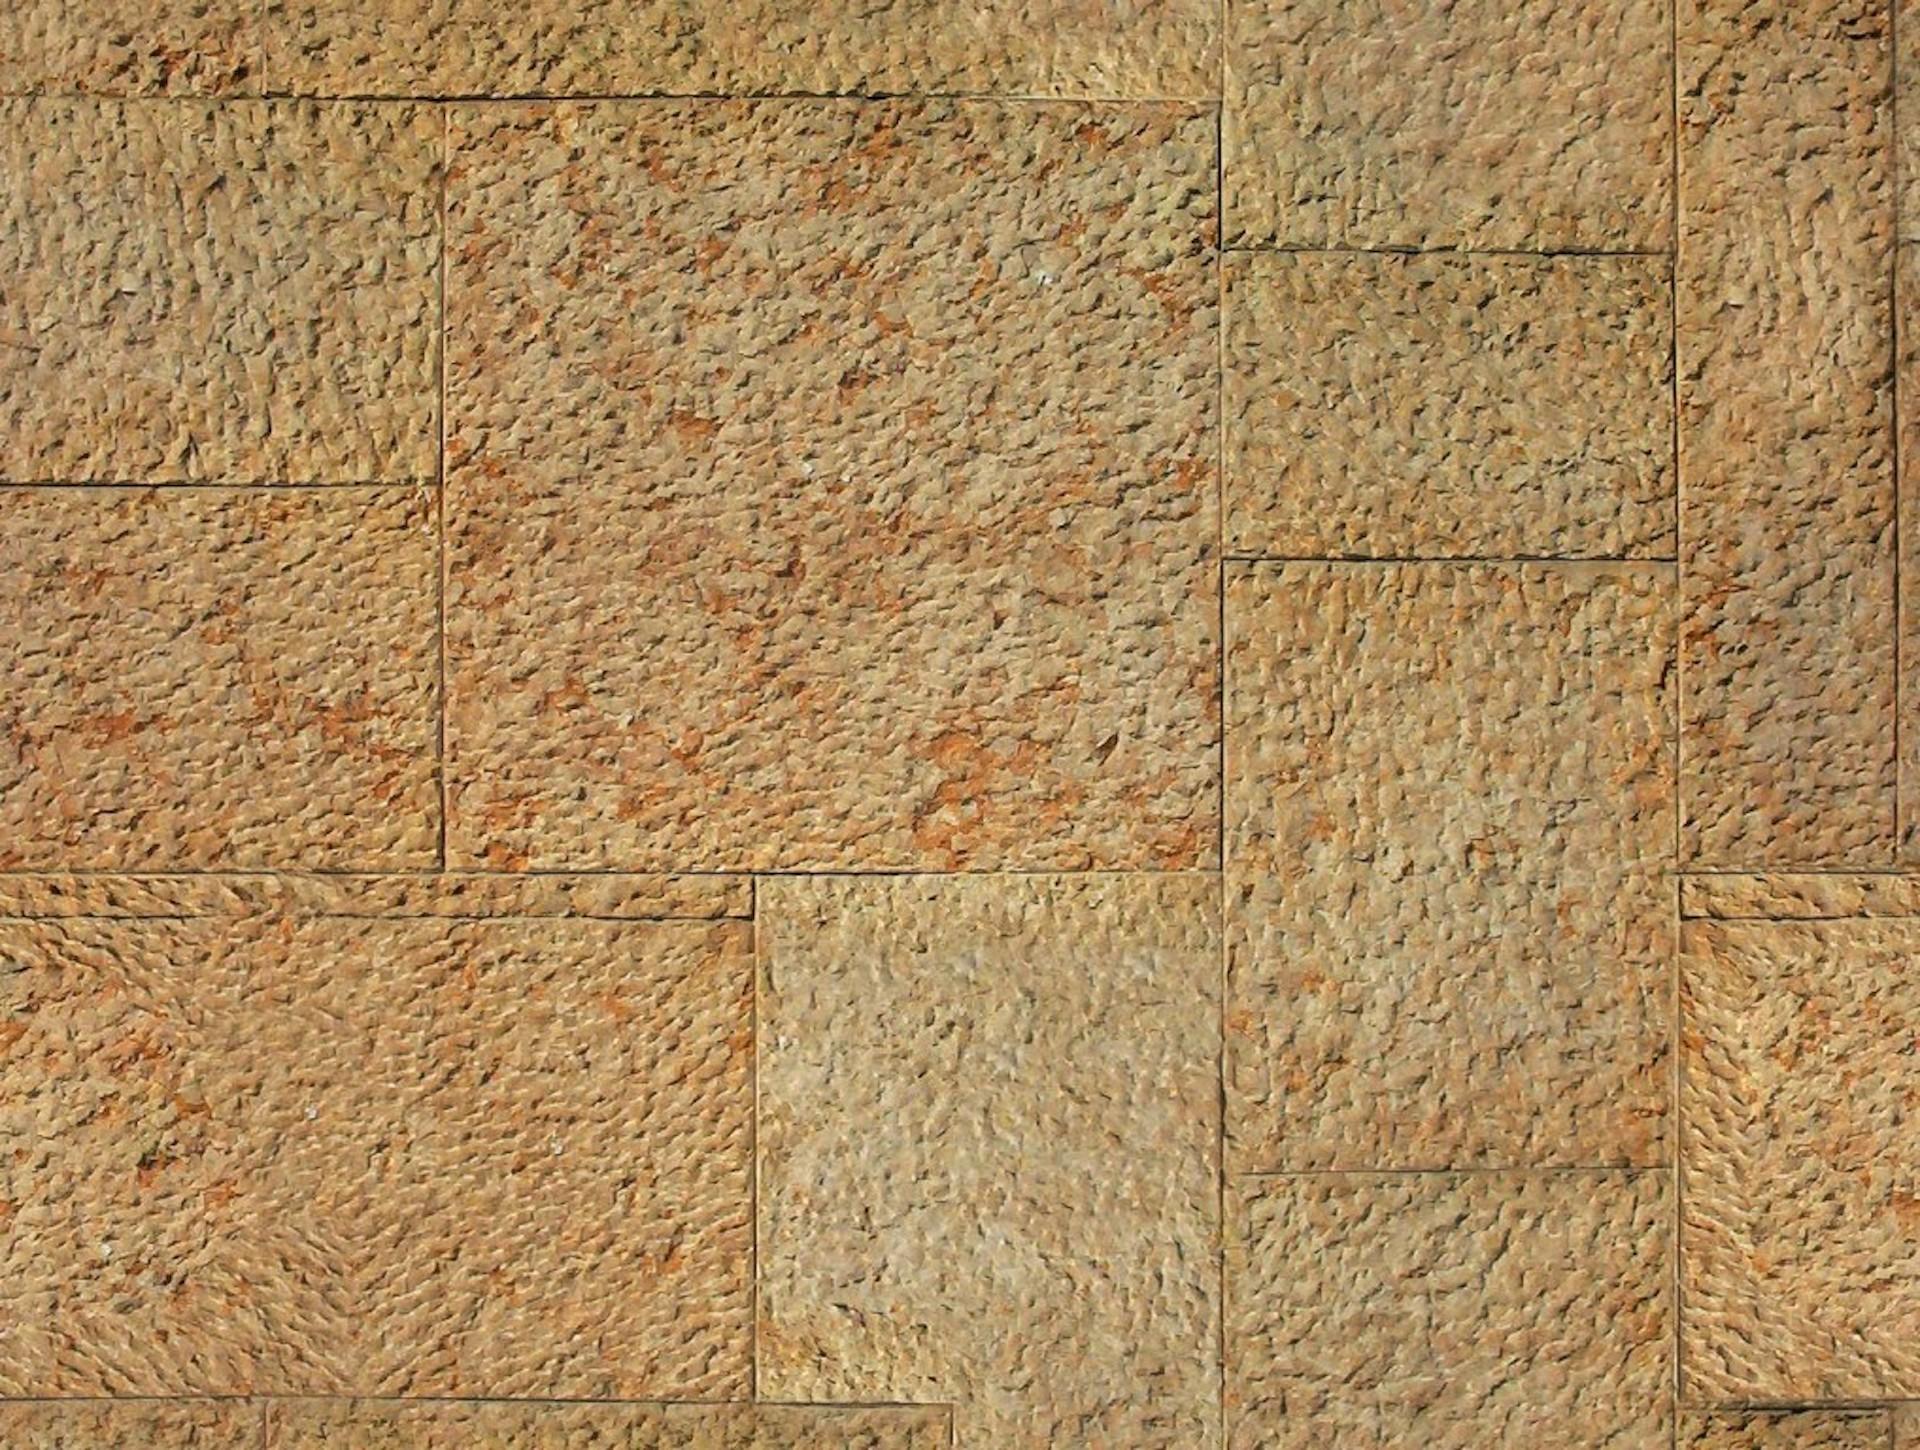 Pietra a muro - Texture - Download - C4Dzone